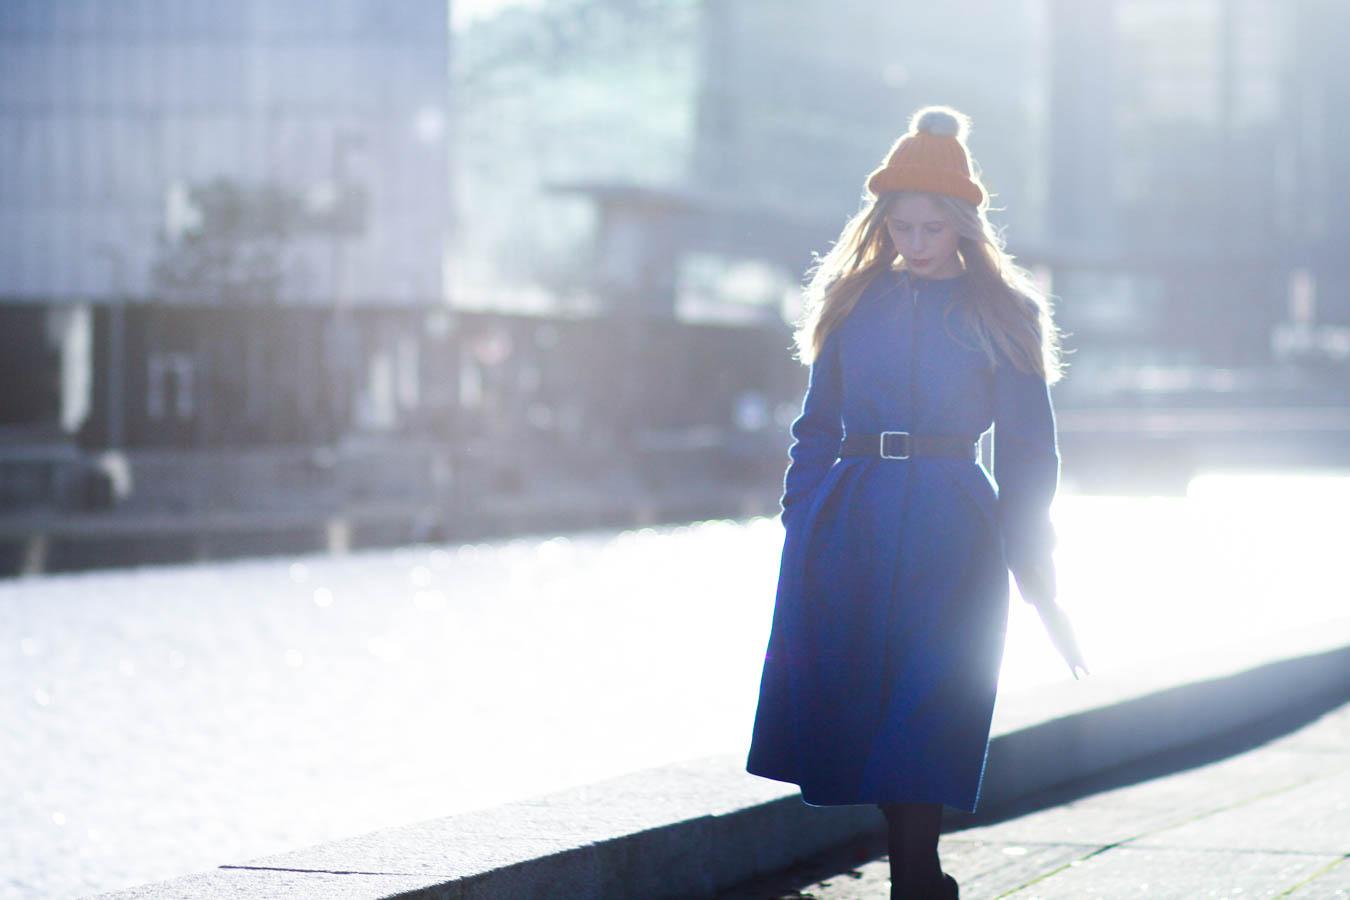 outfit December nemesis babe marie jensen danish blogger -3-2